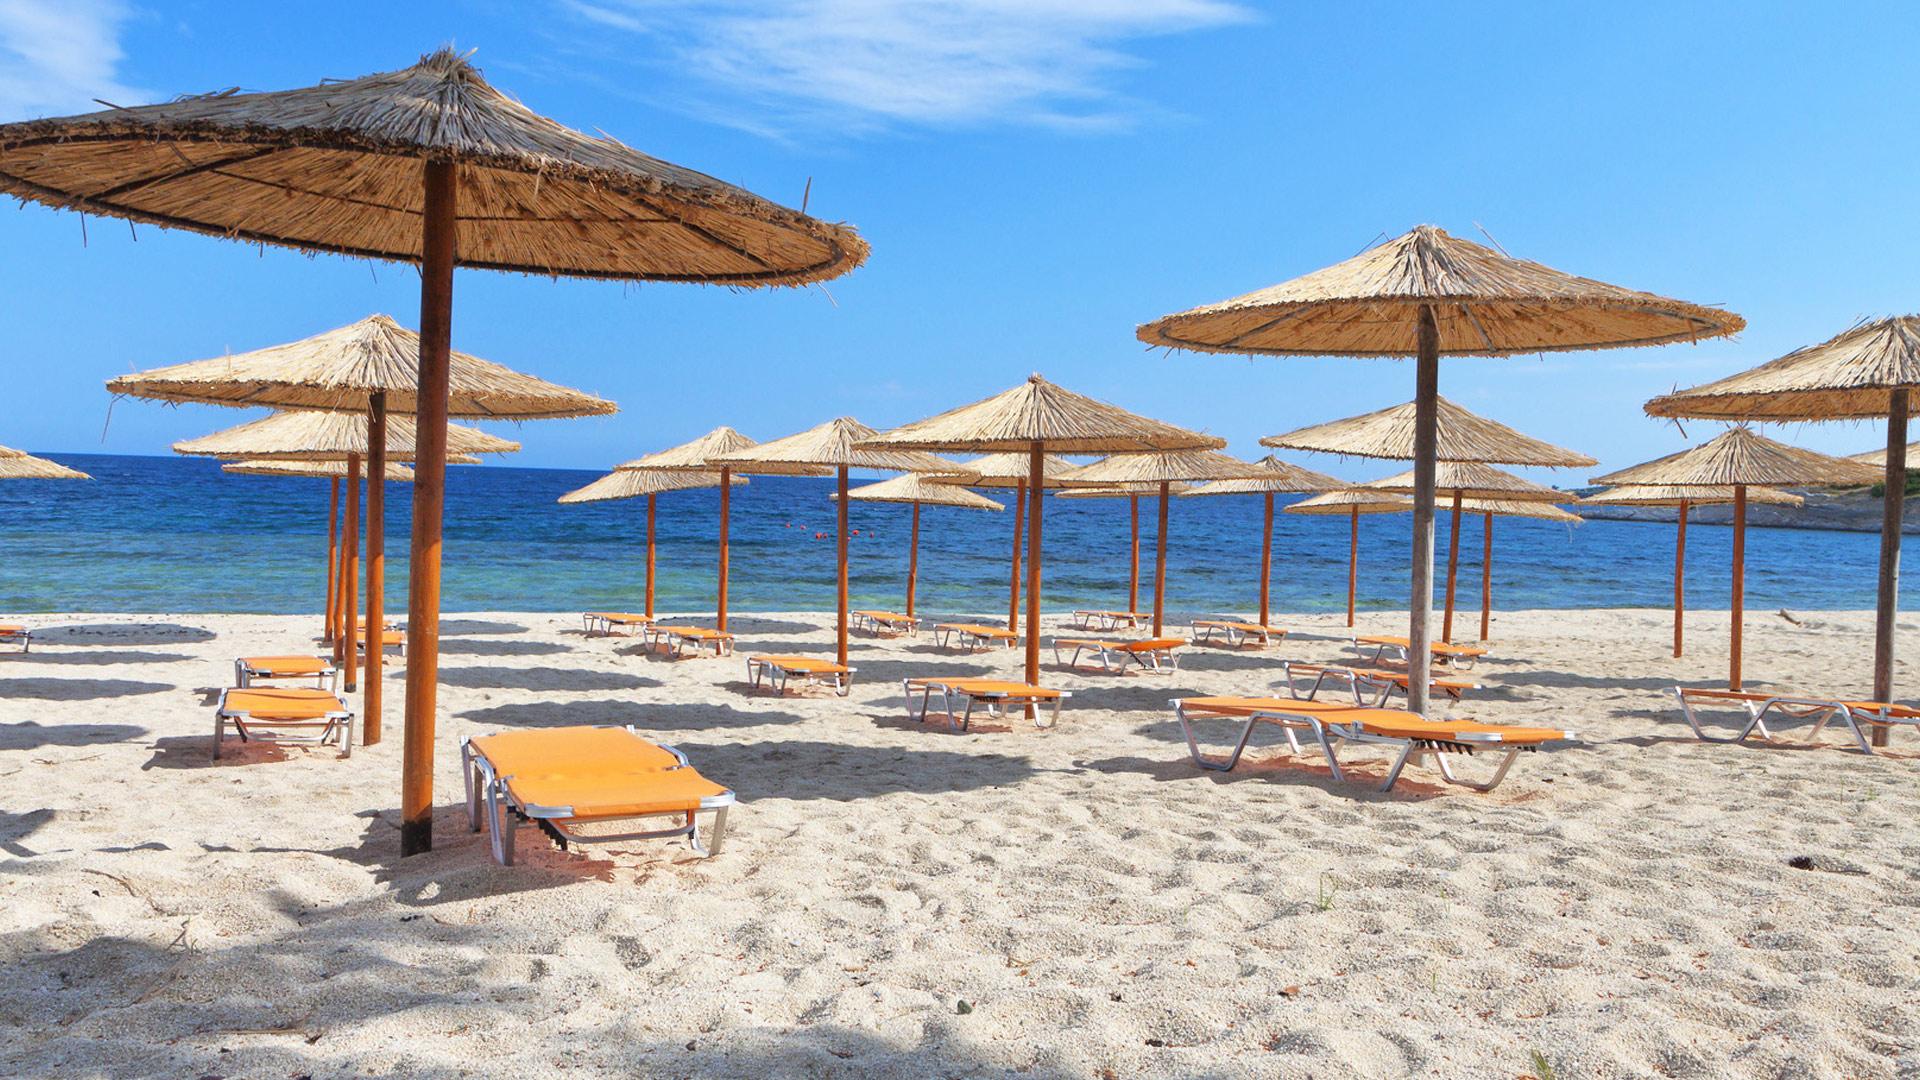 Plaża w Thassos